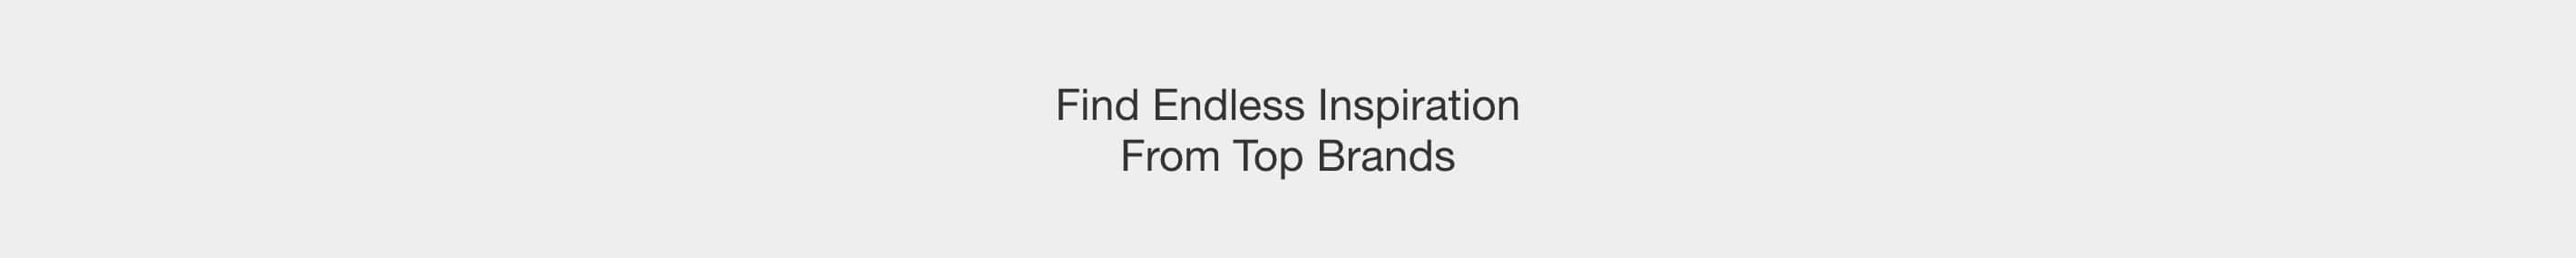 Find Endless Inspiration